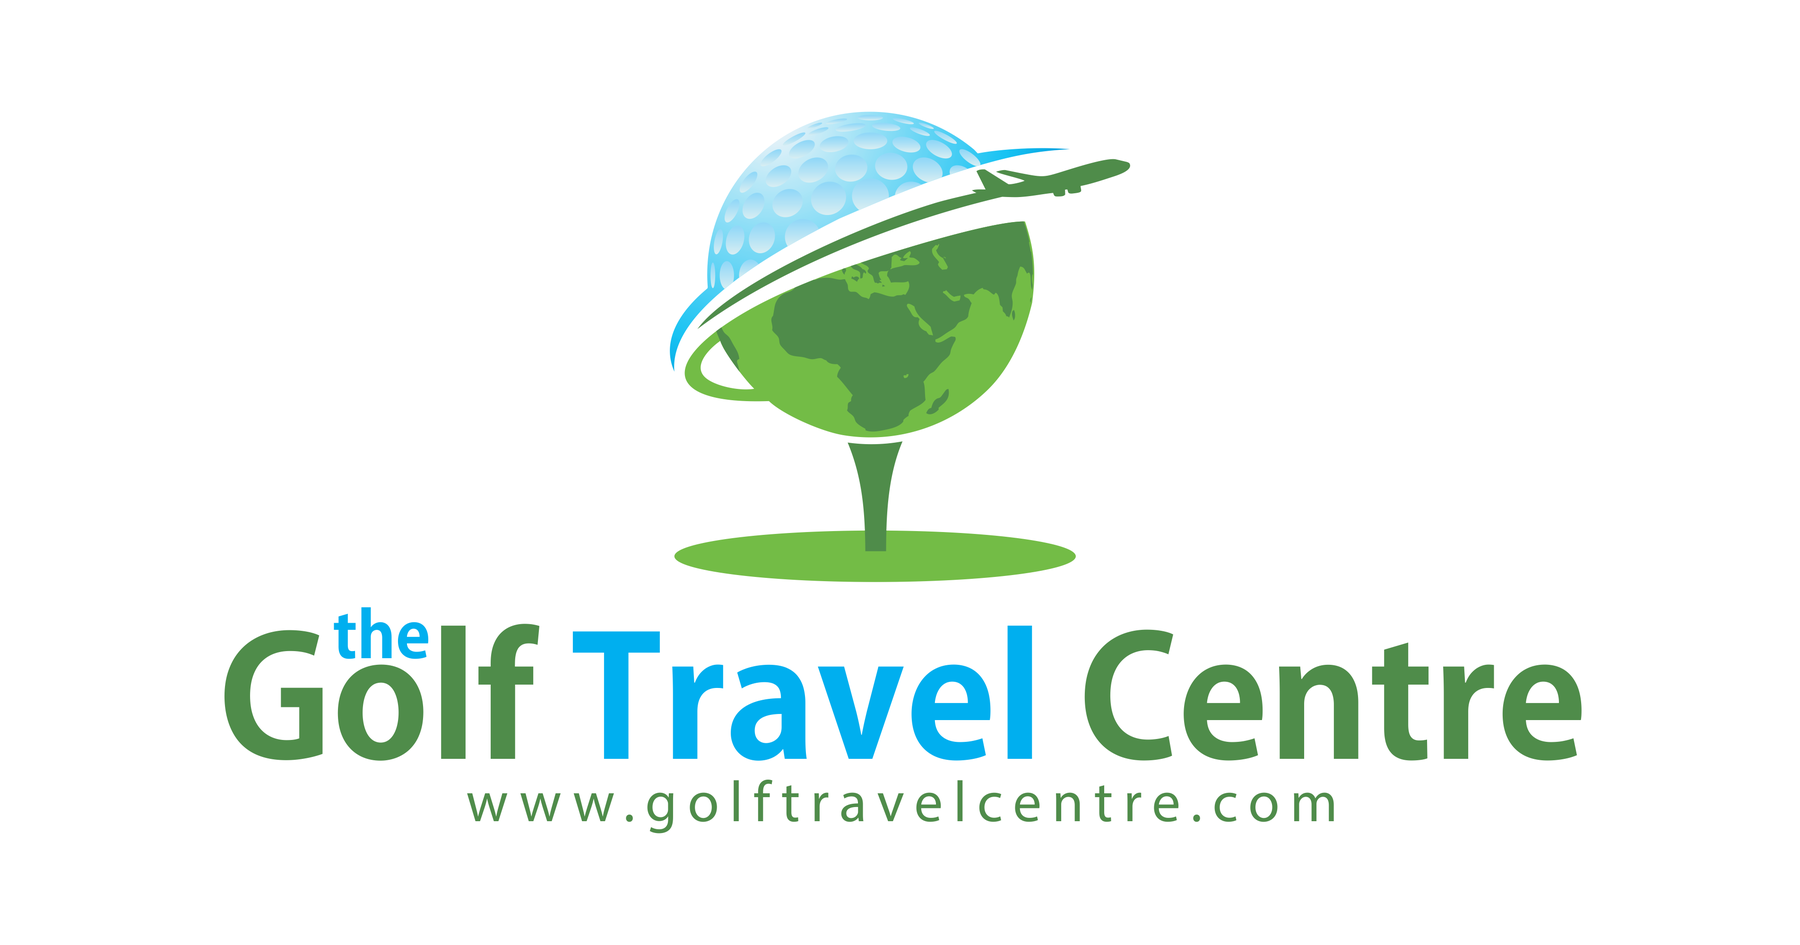 the golf travel center white background